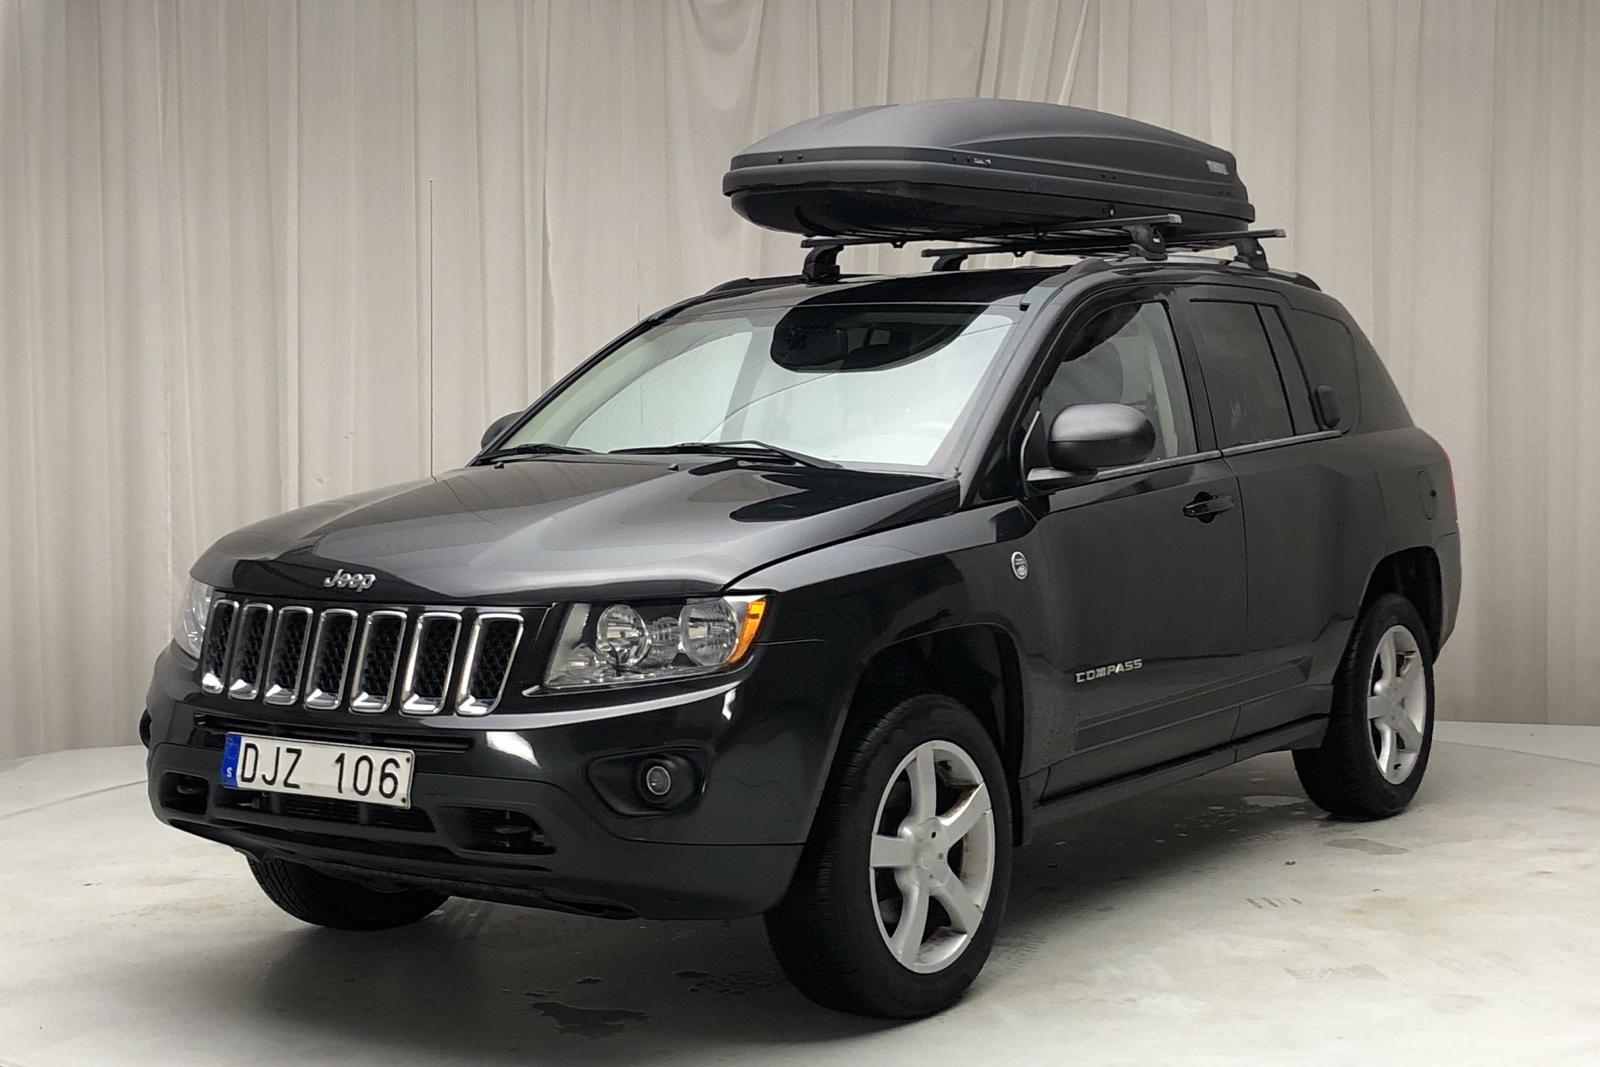 Jeep Compass 2.4 4x4 (170hk) - 7 238 mil - Automat - svart - 2011